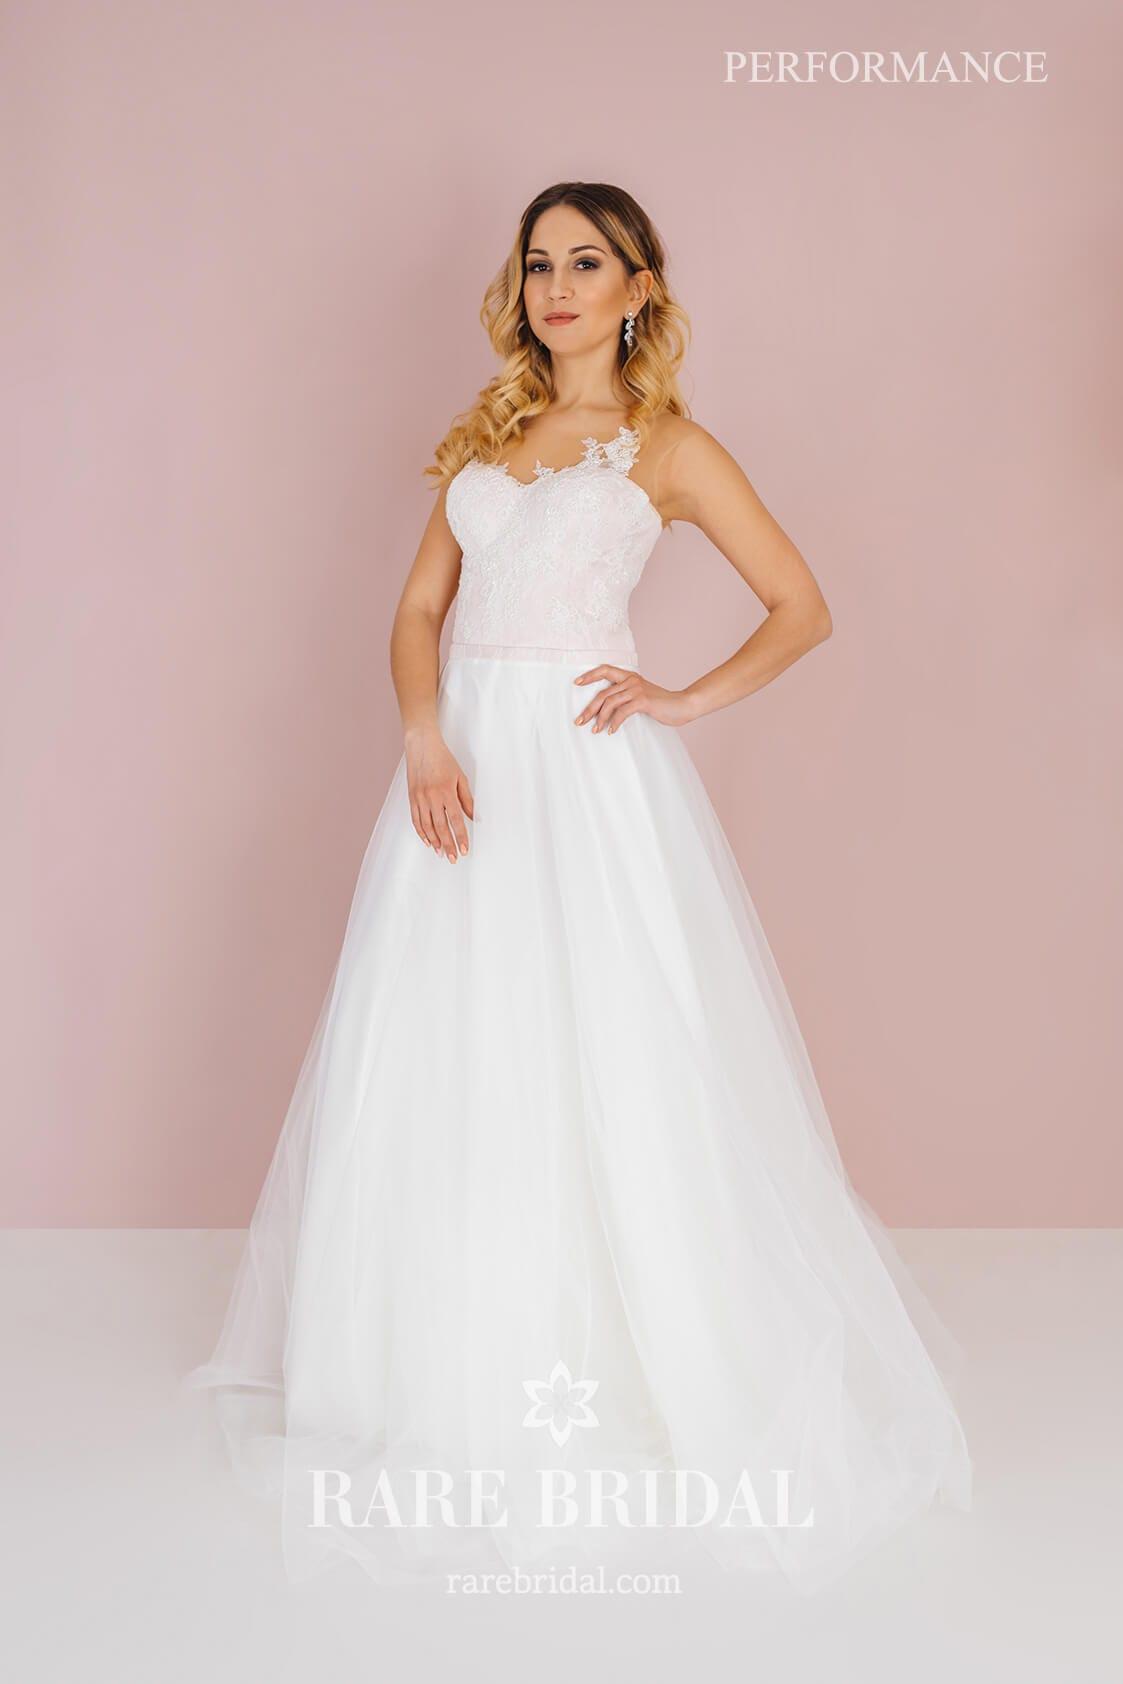 Свадебное платье PERFOMANCE, коллекция LOFT, бренд RARE BRIDAL, фото 1